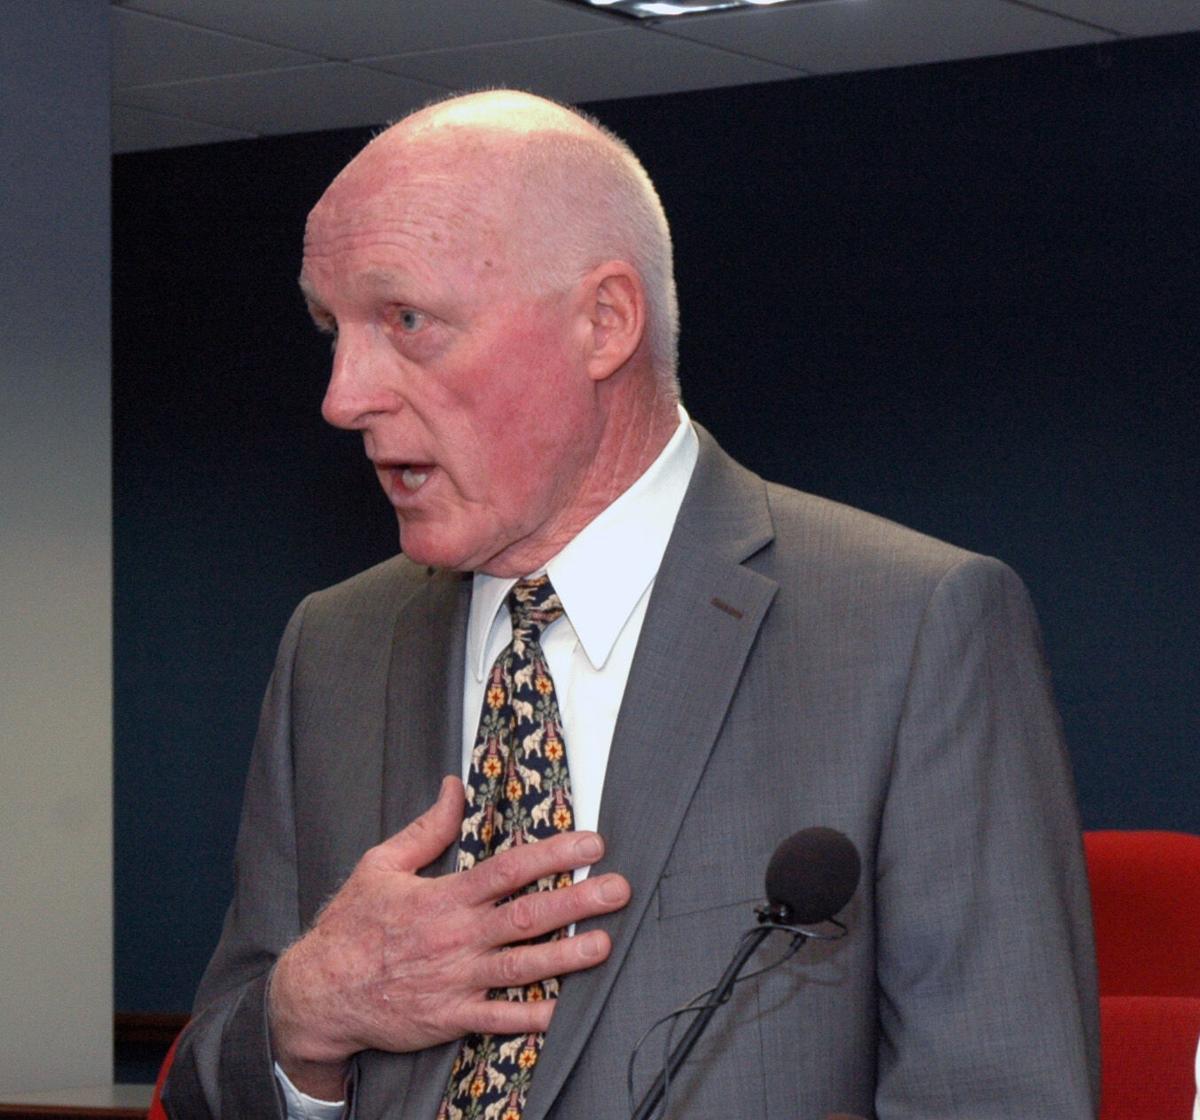 House Speaker Rusty Bowers